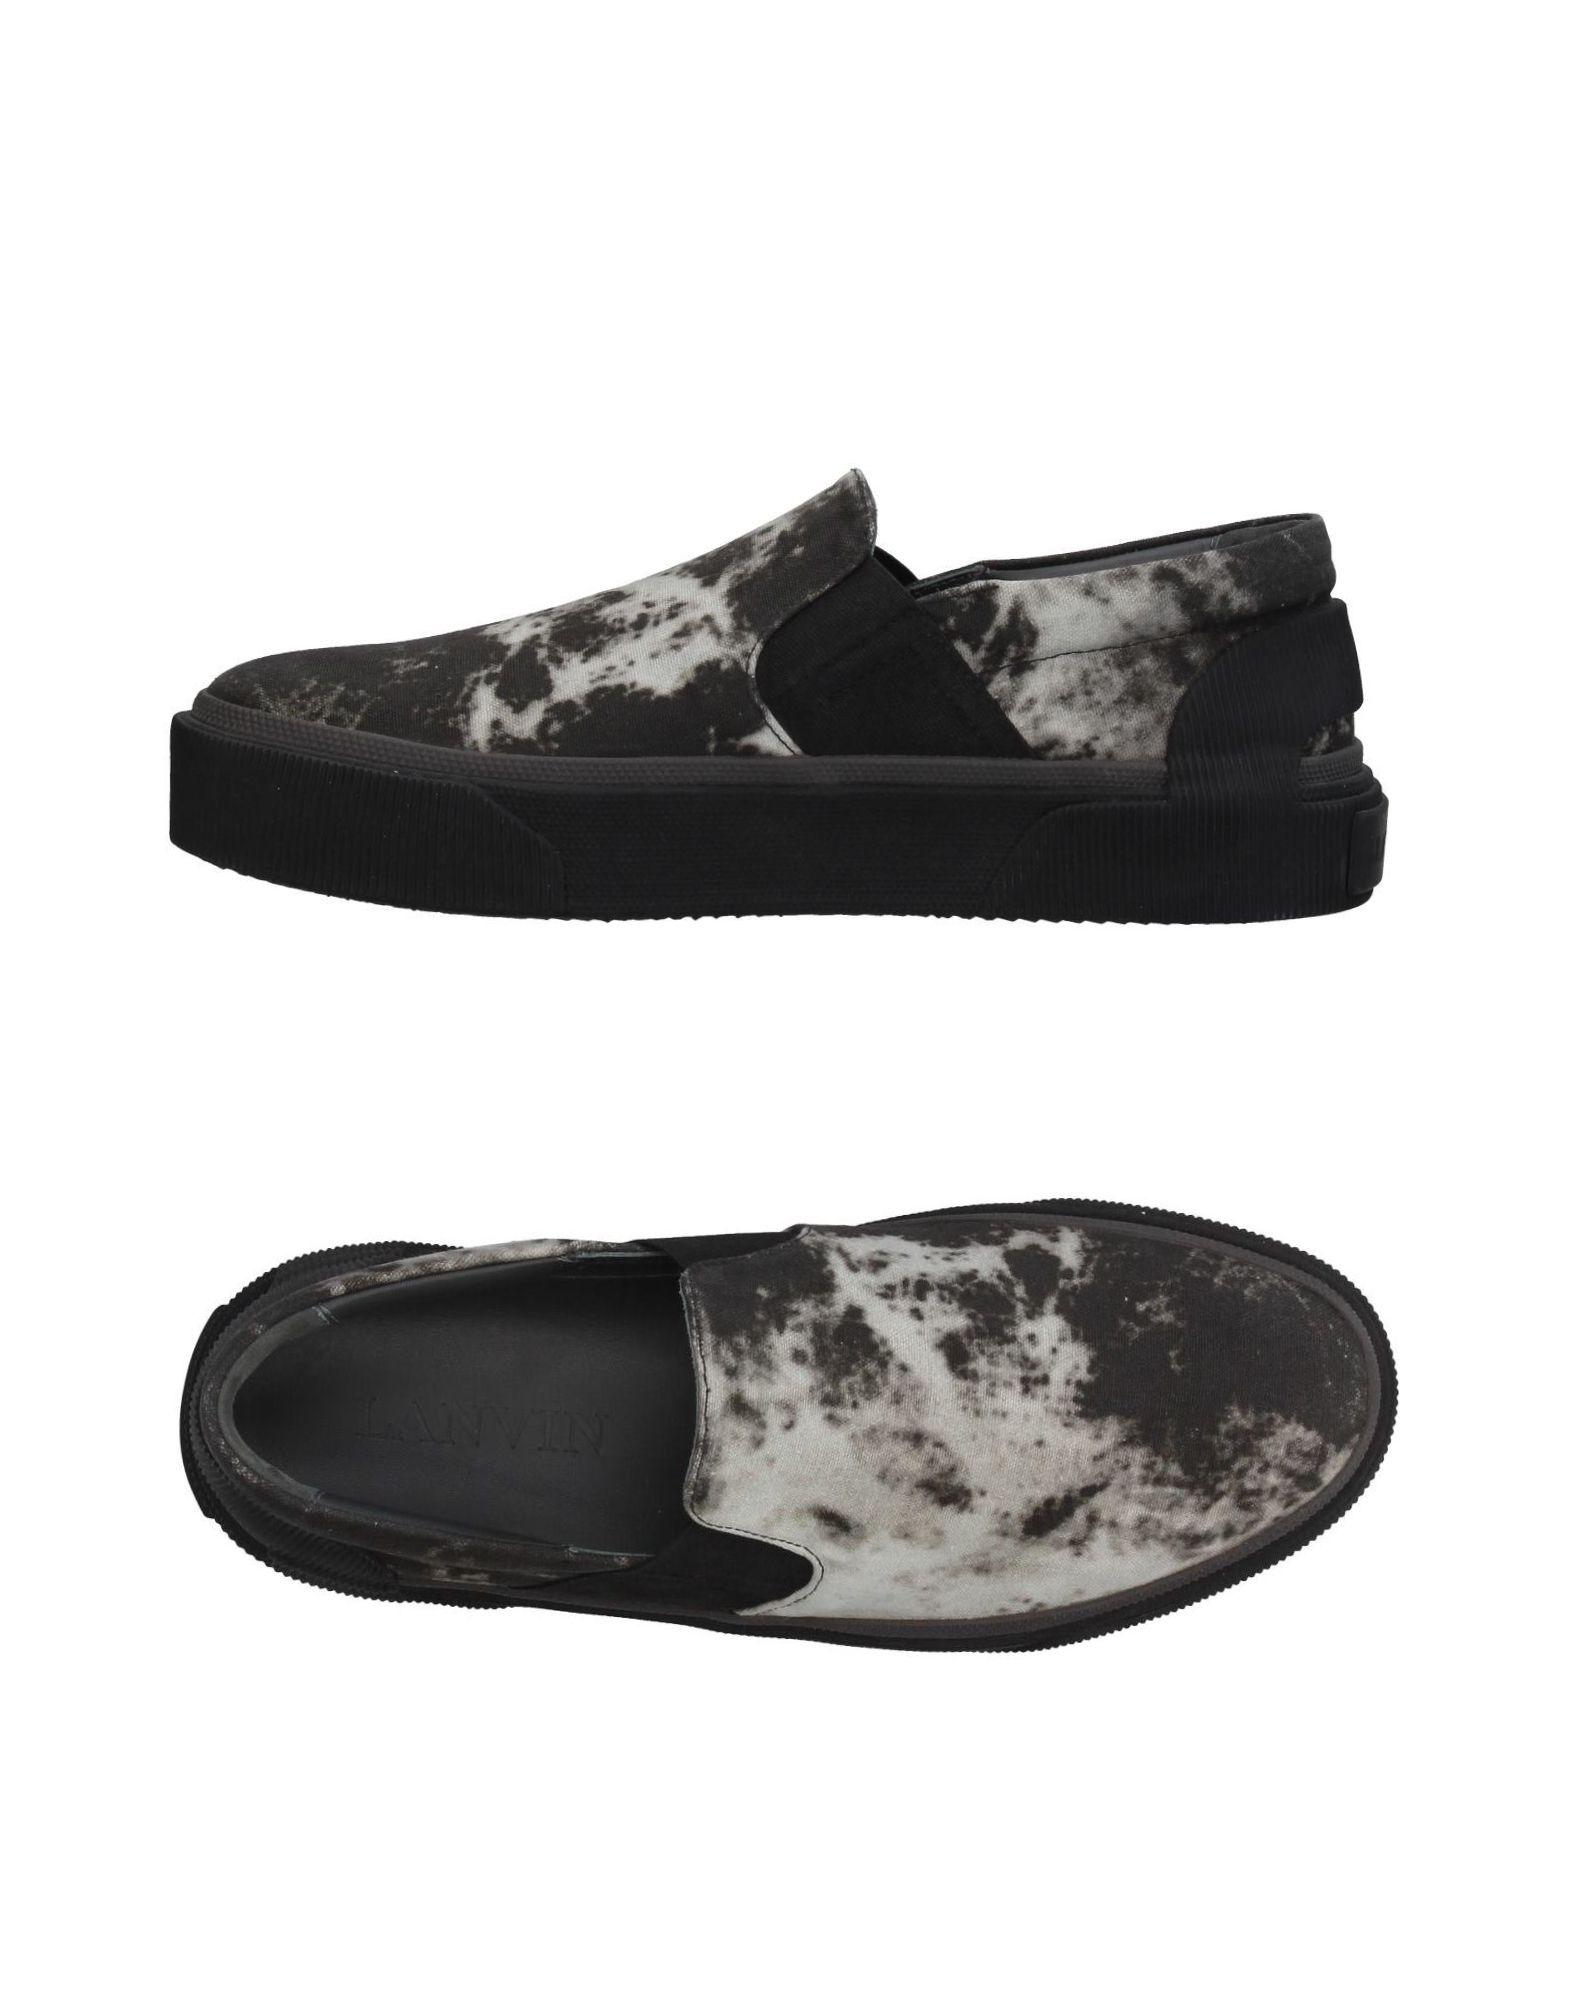 Lanvin Sneakers Herren  11402390DX Gute Qualität beliebte Schuhe